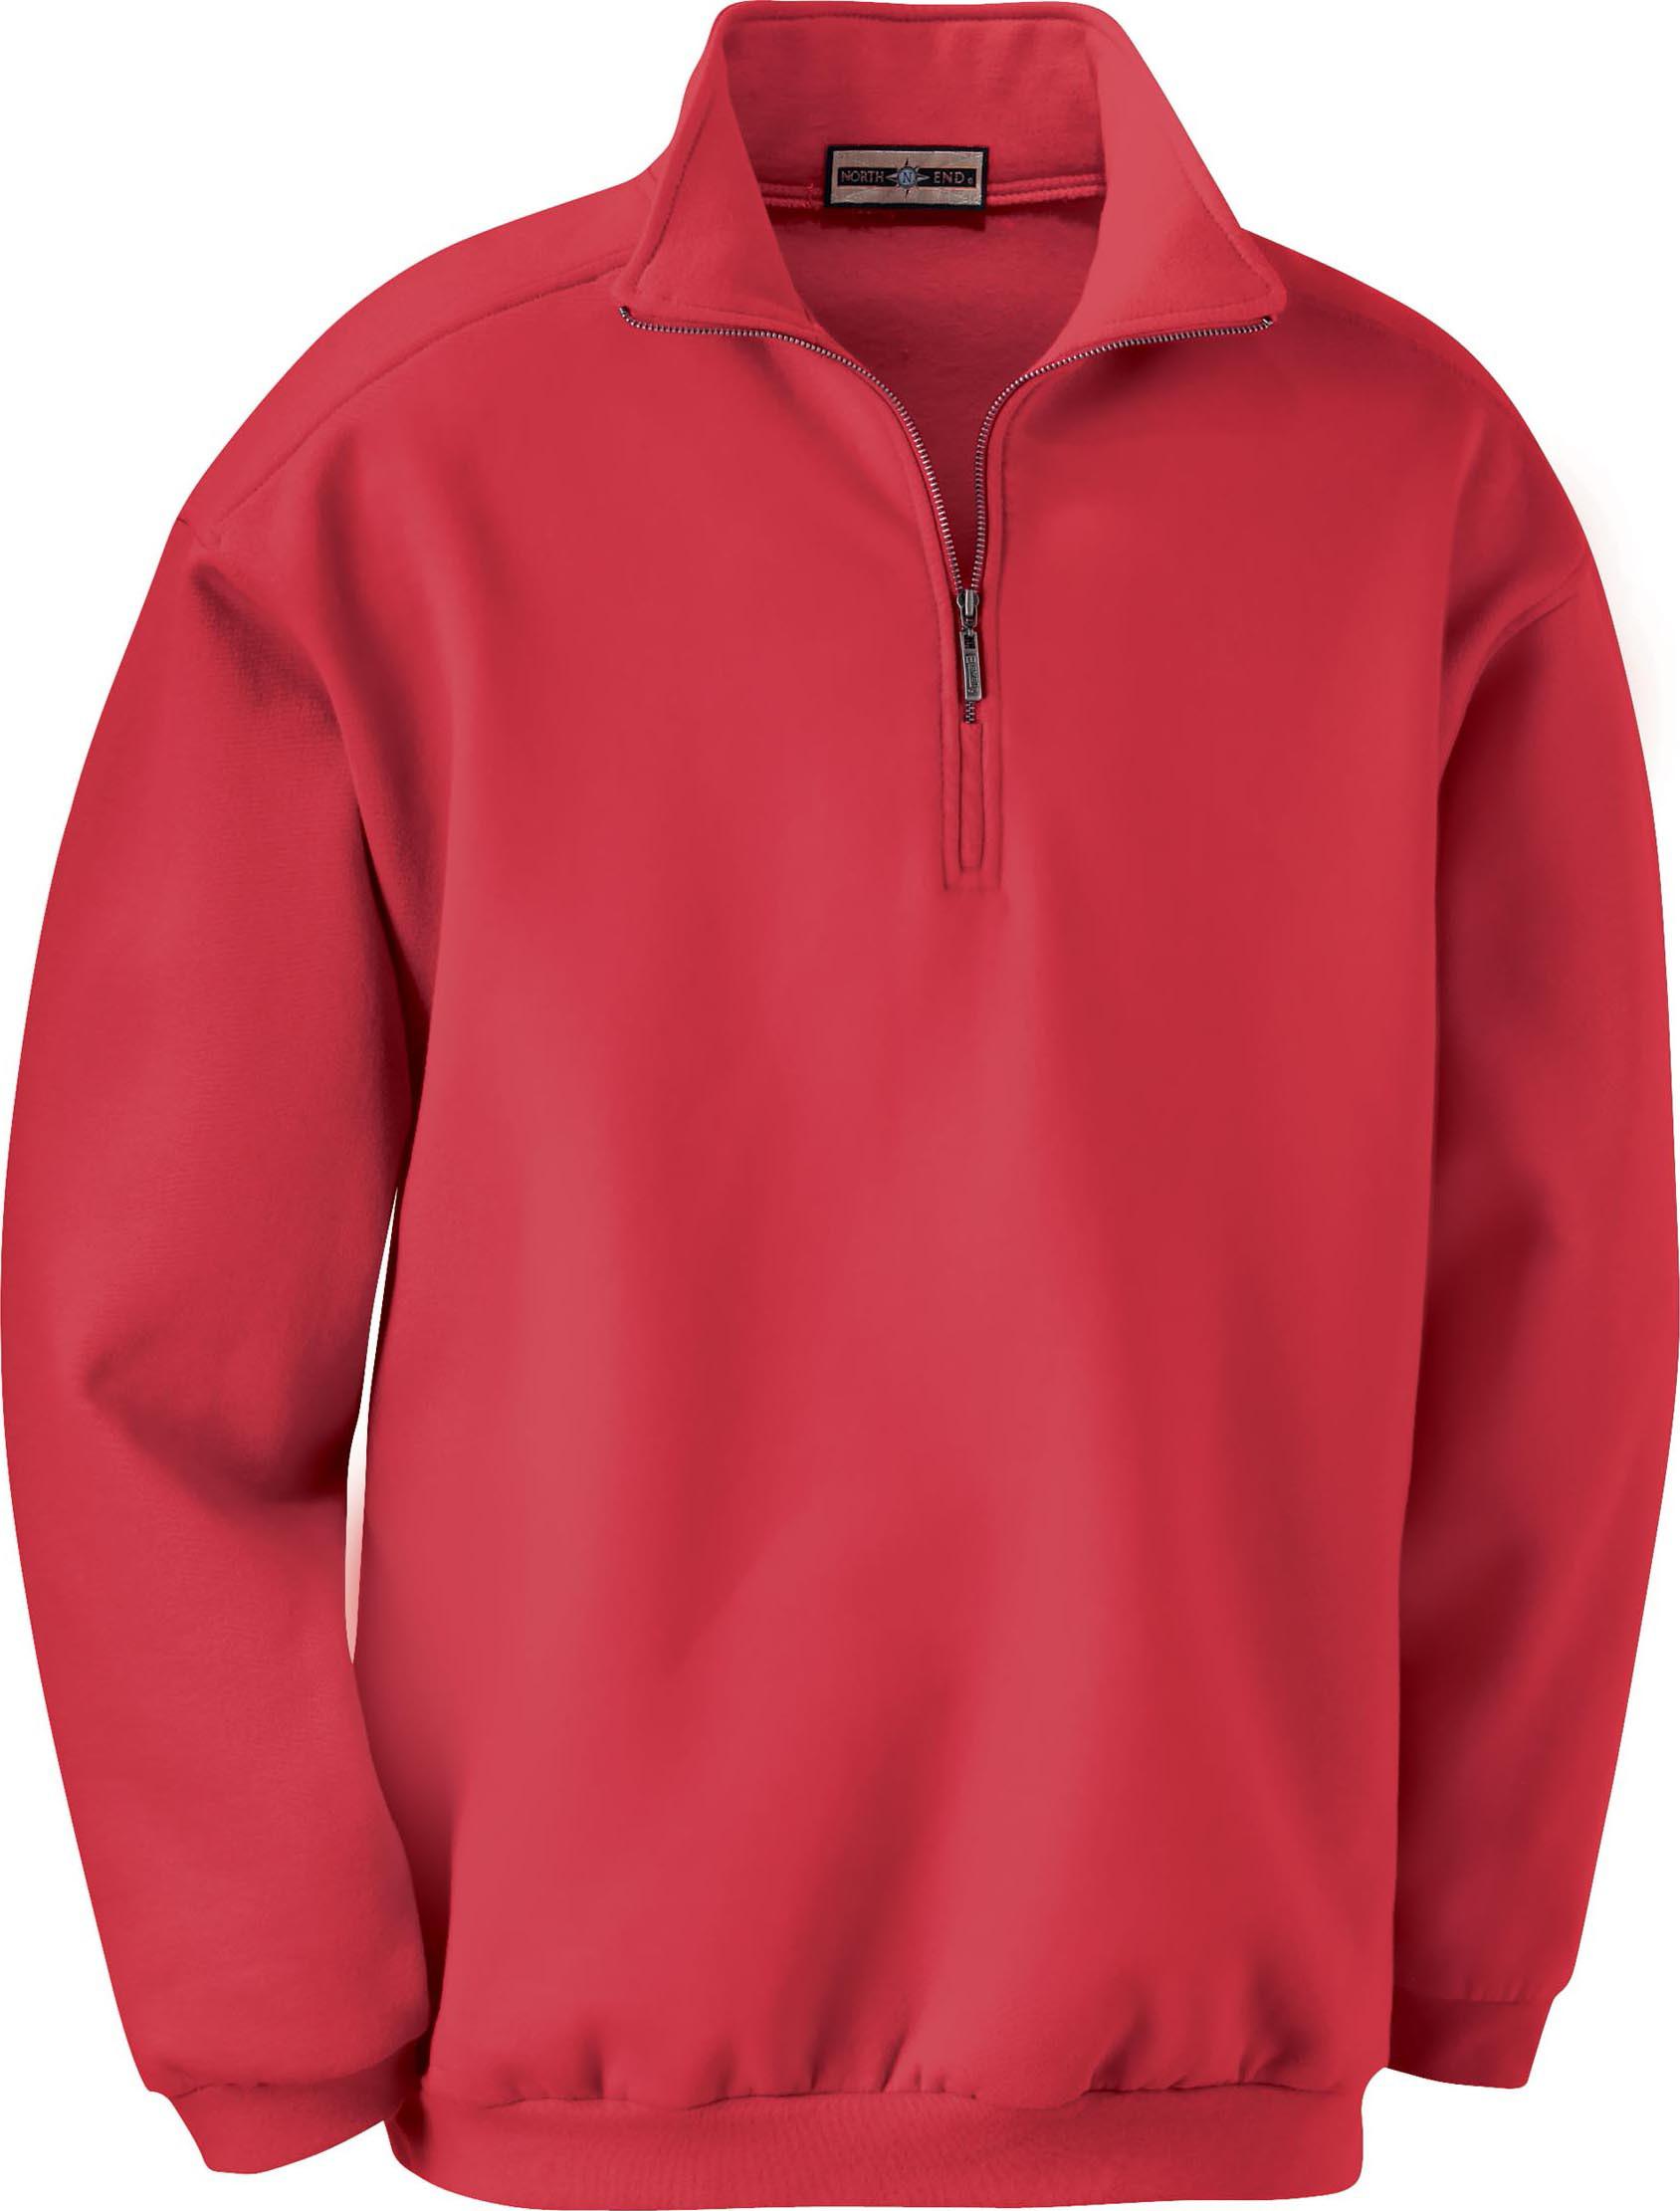 Ash City Cotton/Poly Fleece 221442 - Men's Classical Cotton Blend Fleece Half-Zip